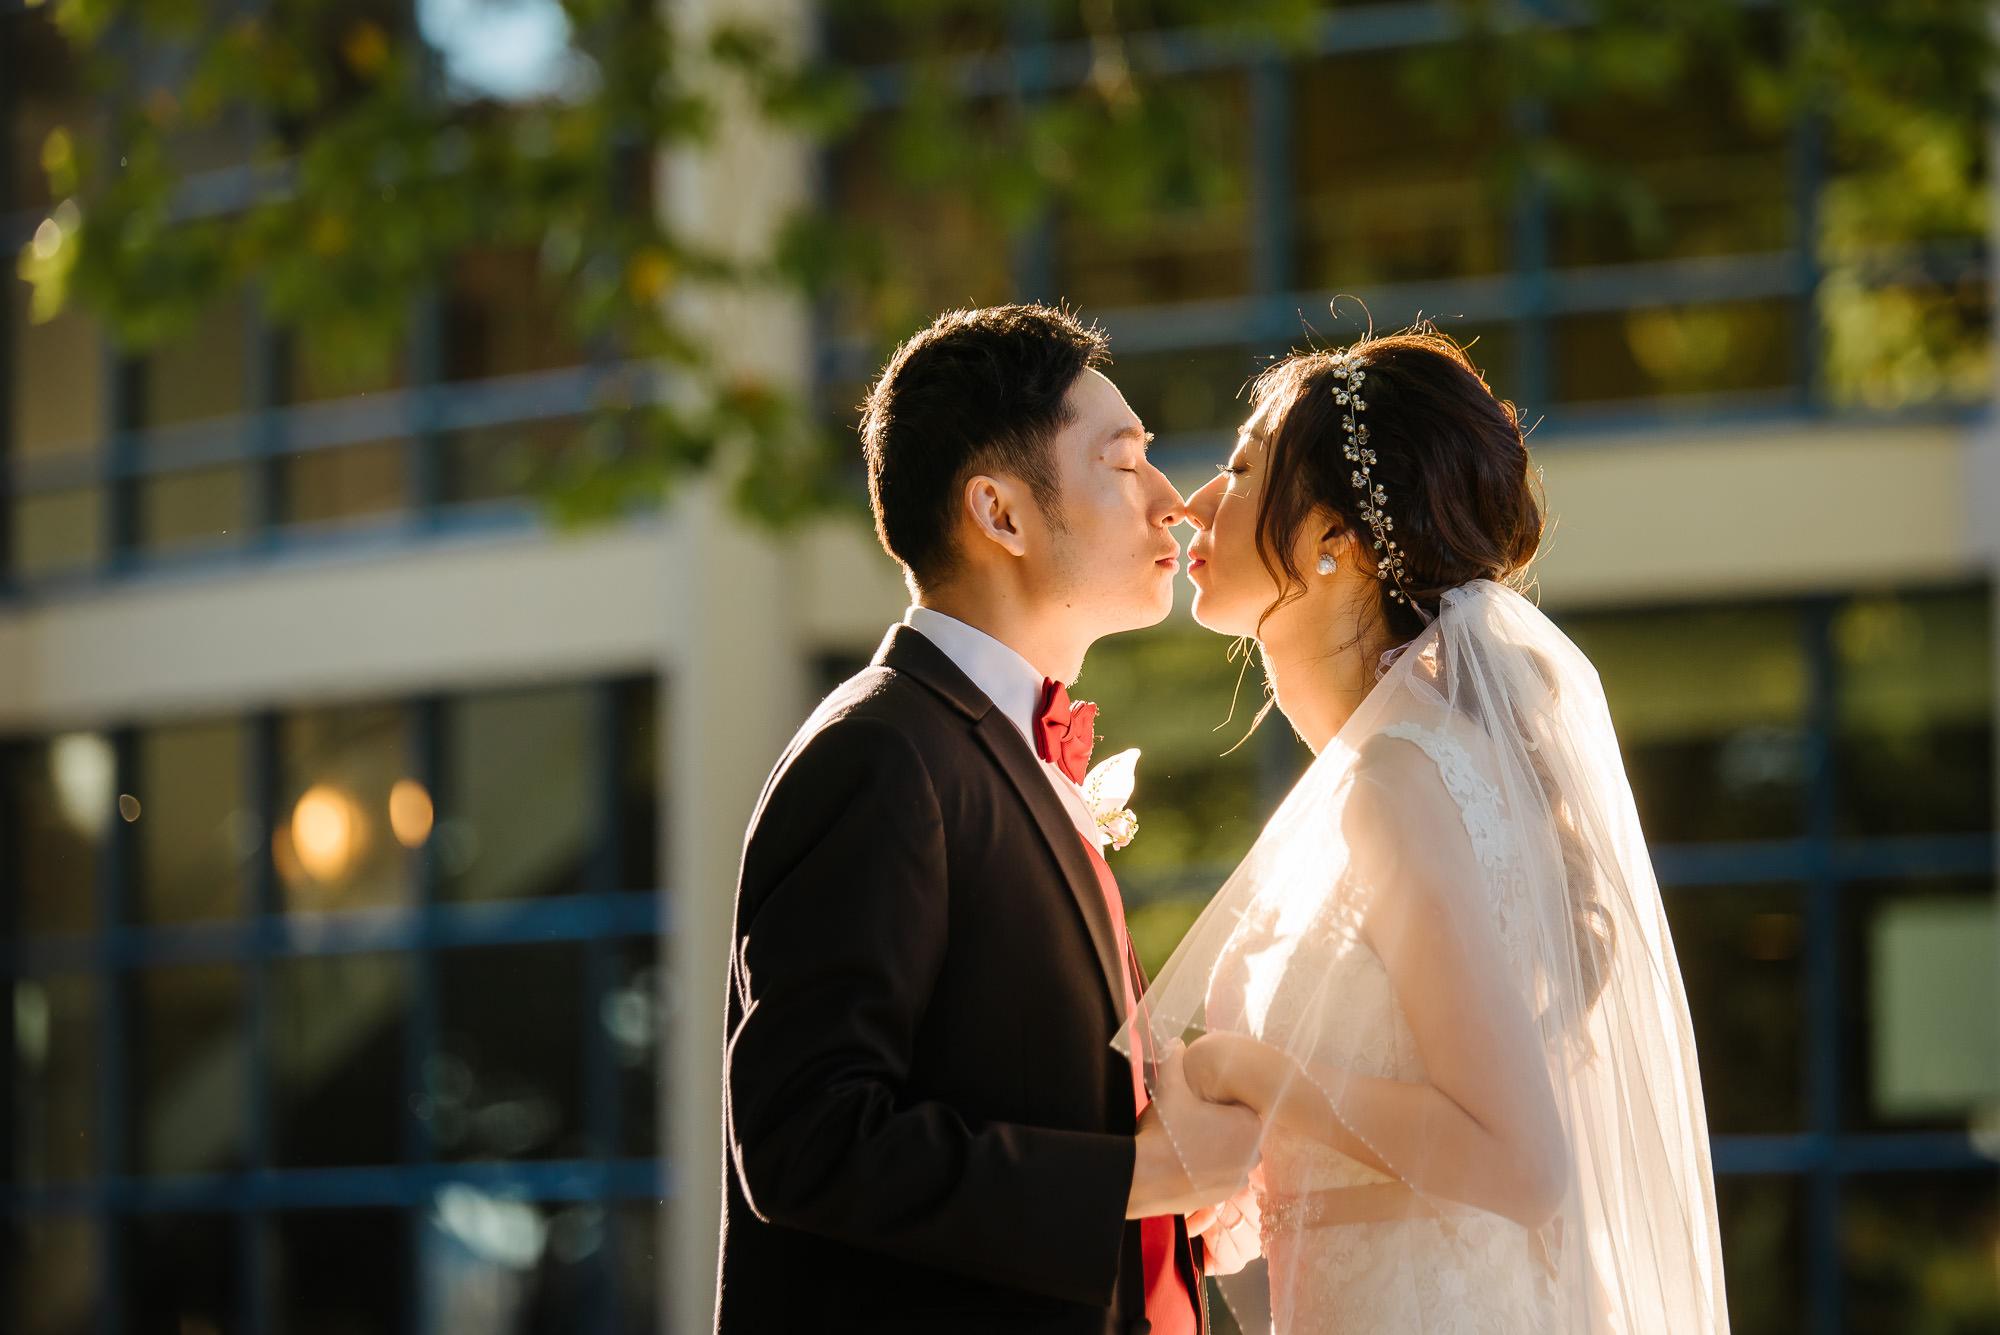 minoru_chapel_richmond_wedding_ceremony 17183622.jpg